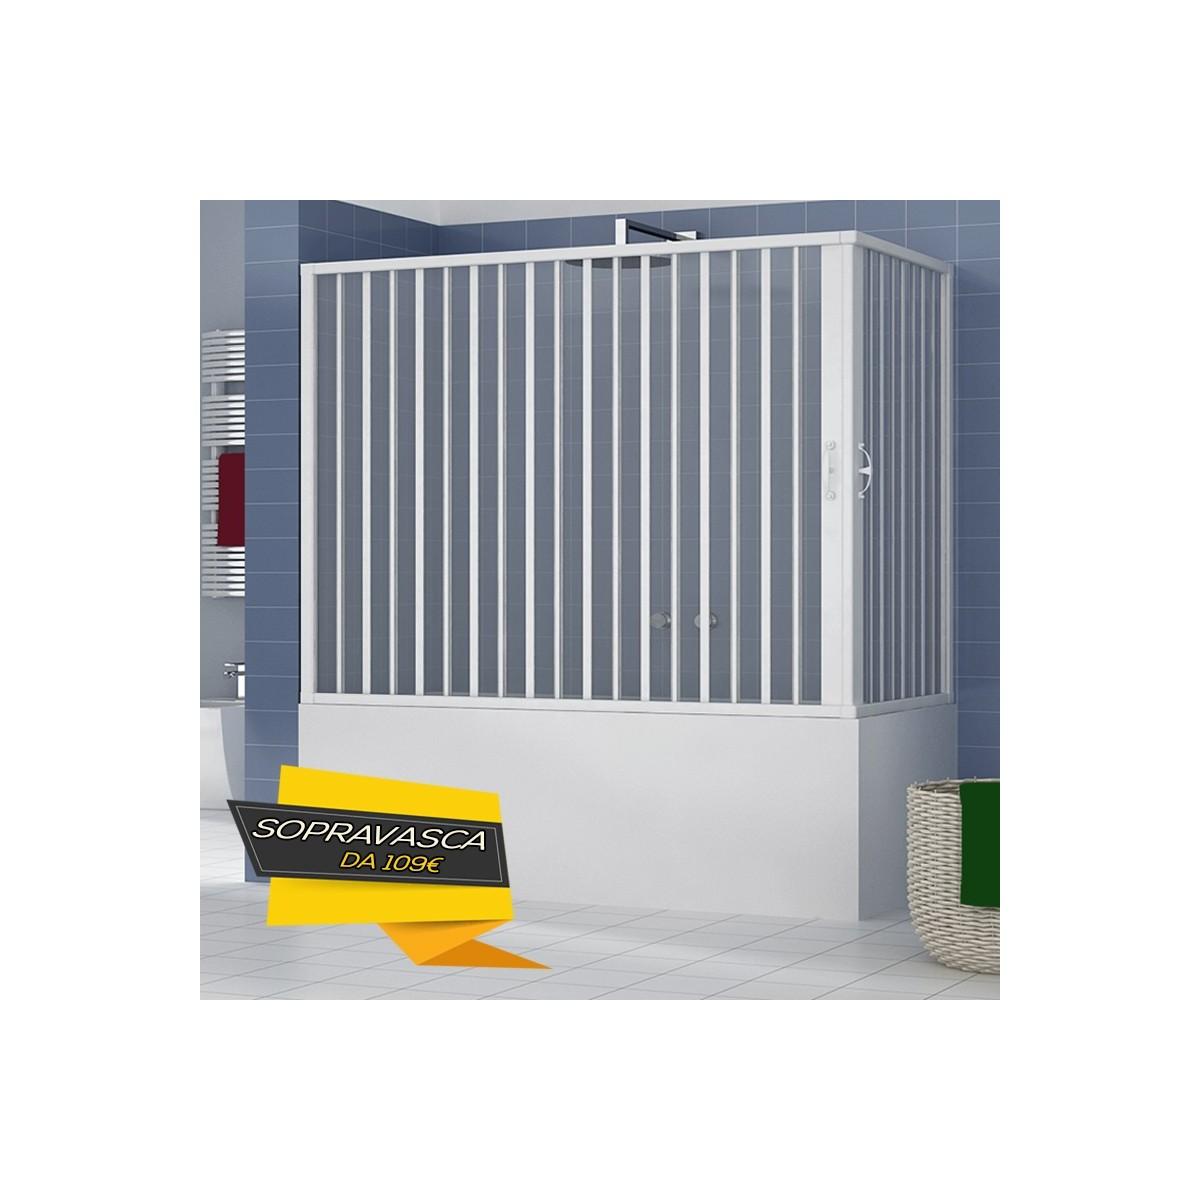 Box Doccia Parete Vasca a soffietto in pvc 70x140 70x150 70x160 70x170